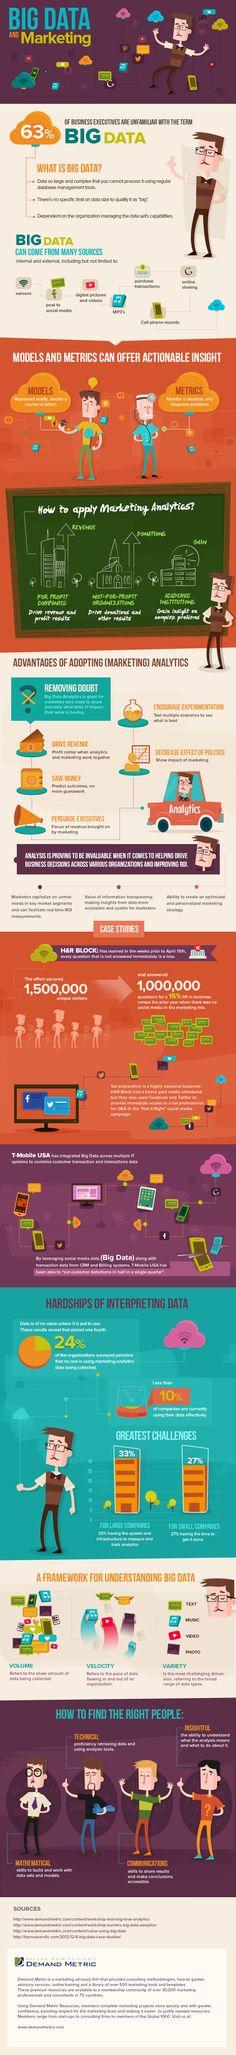 BIG DATA And Marketing #Infographic #Marketing